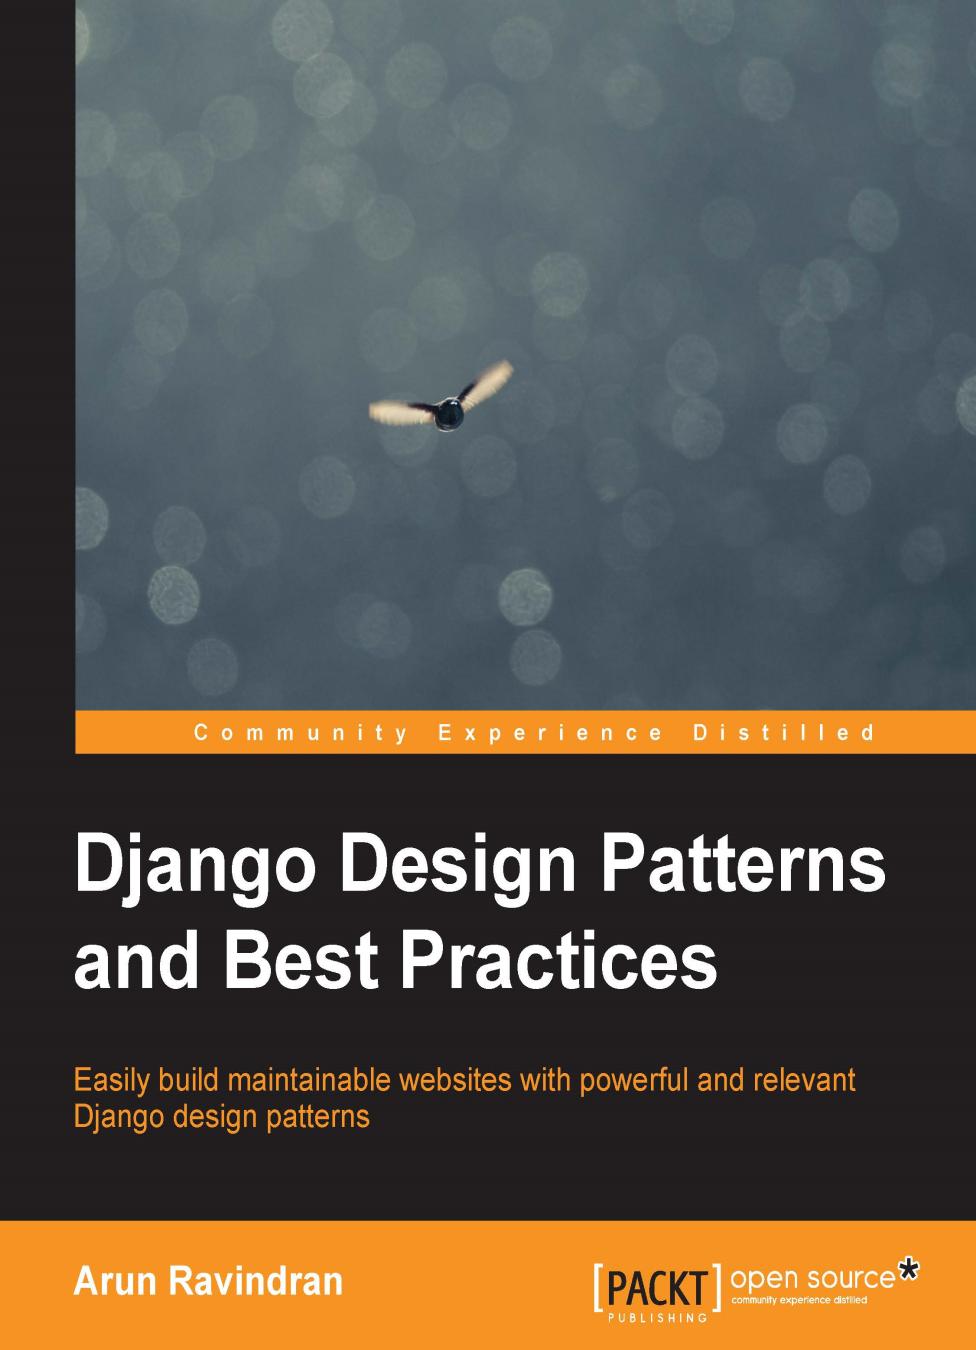 Django Design Patterns and Best Practices - X | manualzz com